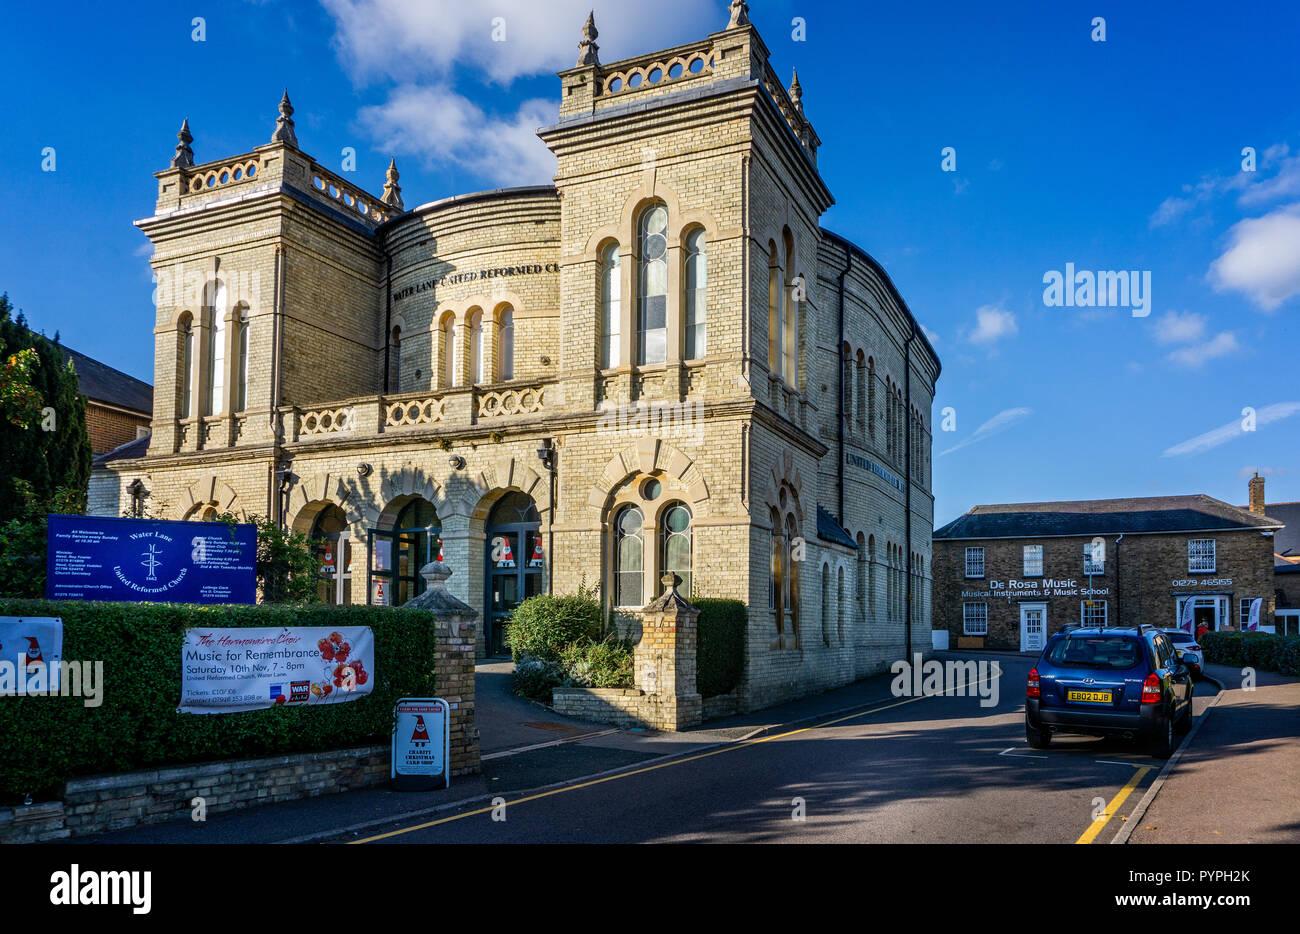 Water Lane United Reform Church in Bishop's Stortford, Hertfordshire, UK on 25 October 2018 Stock Photo